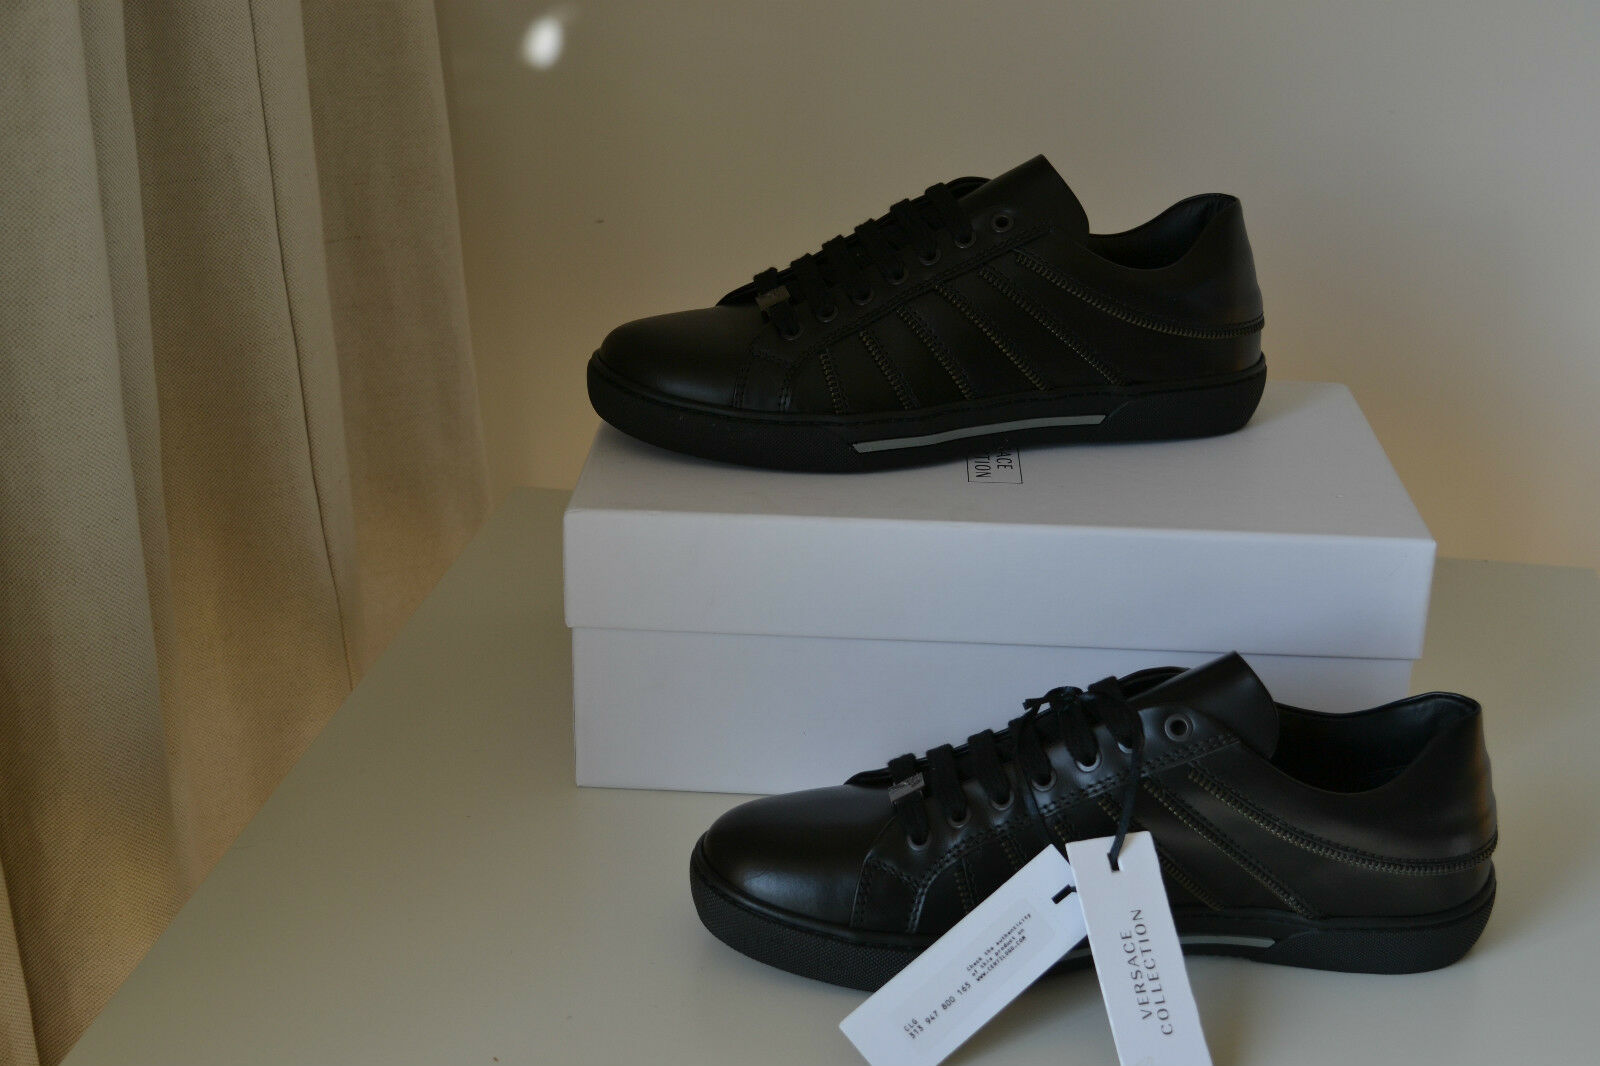 NEW VERSACE BLACK COLLECTION BLACK VERSACE LEATHER ZIP SNEAKER Schuhe SIZE 9 AUTHENTIC c2d7e7